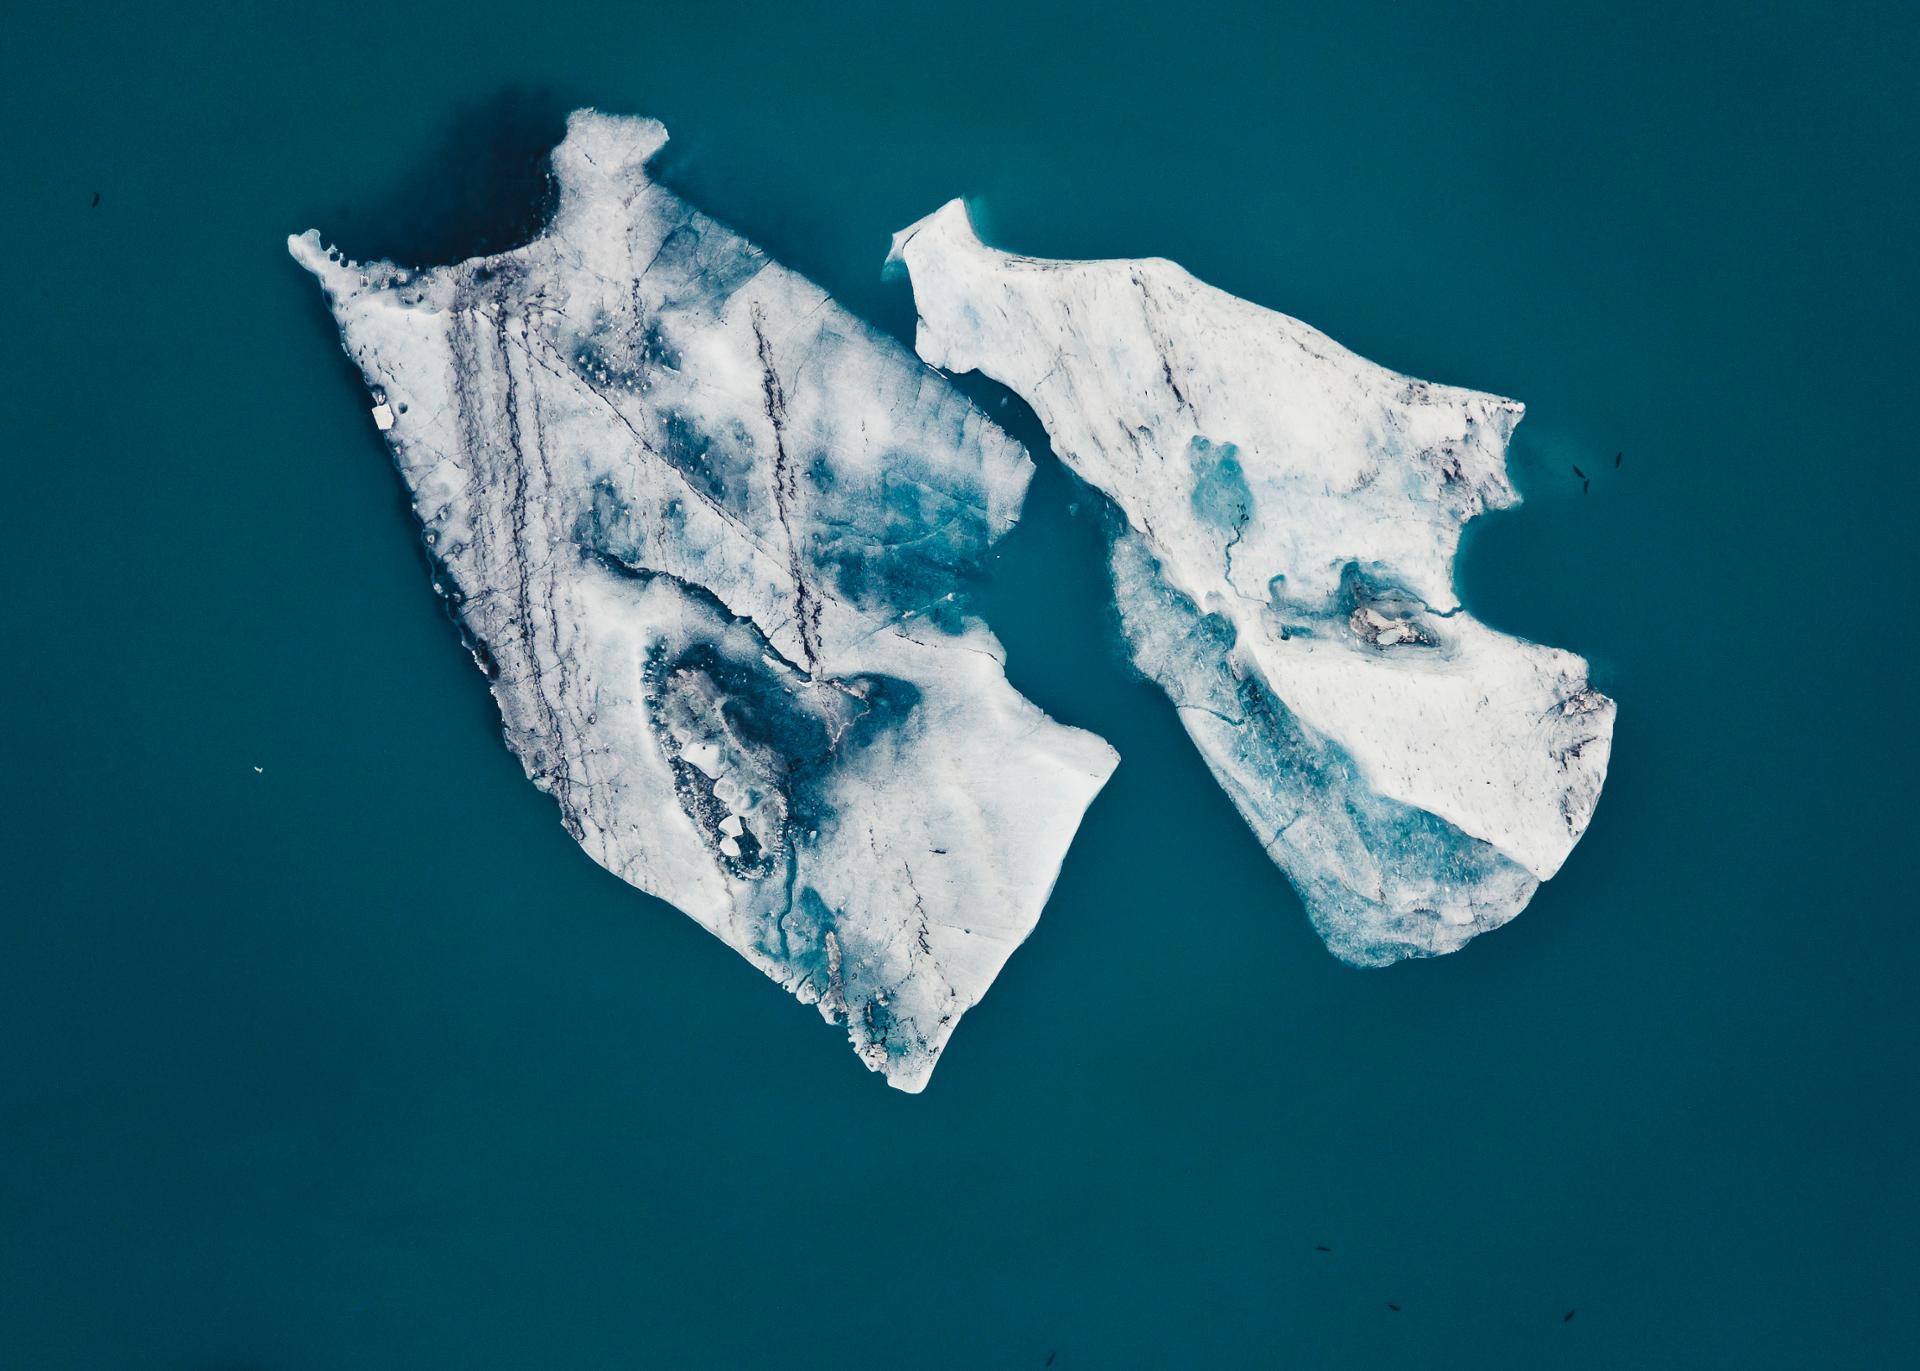 Iceberg of Jokulsarlon, Iceland